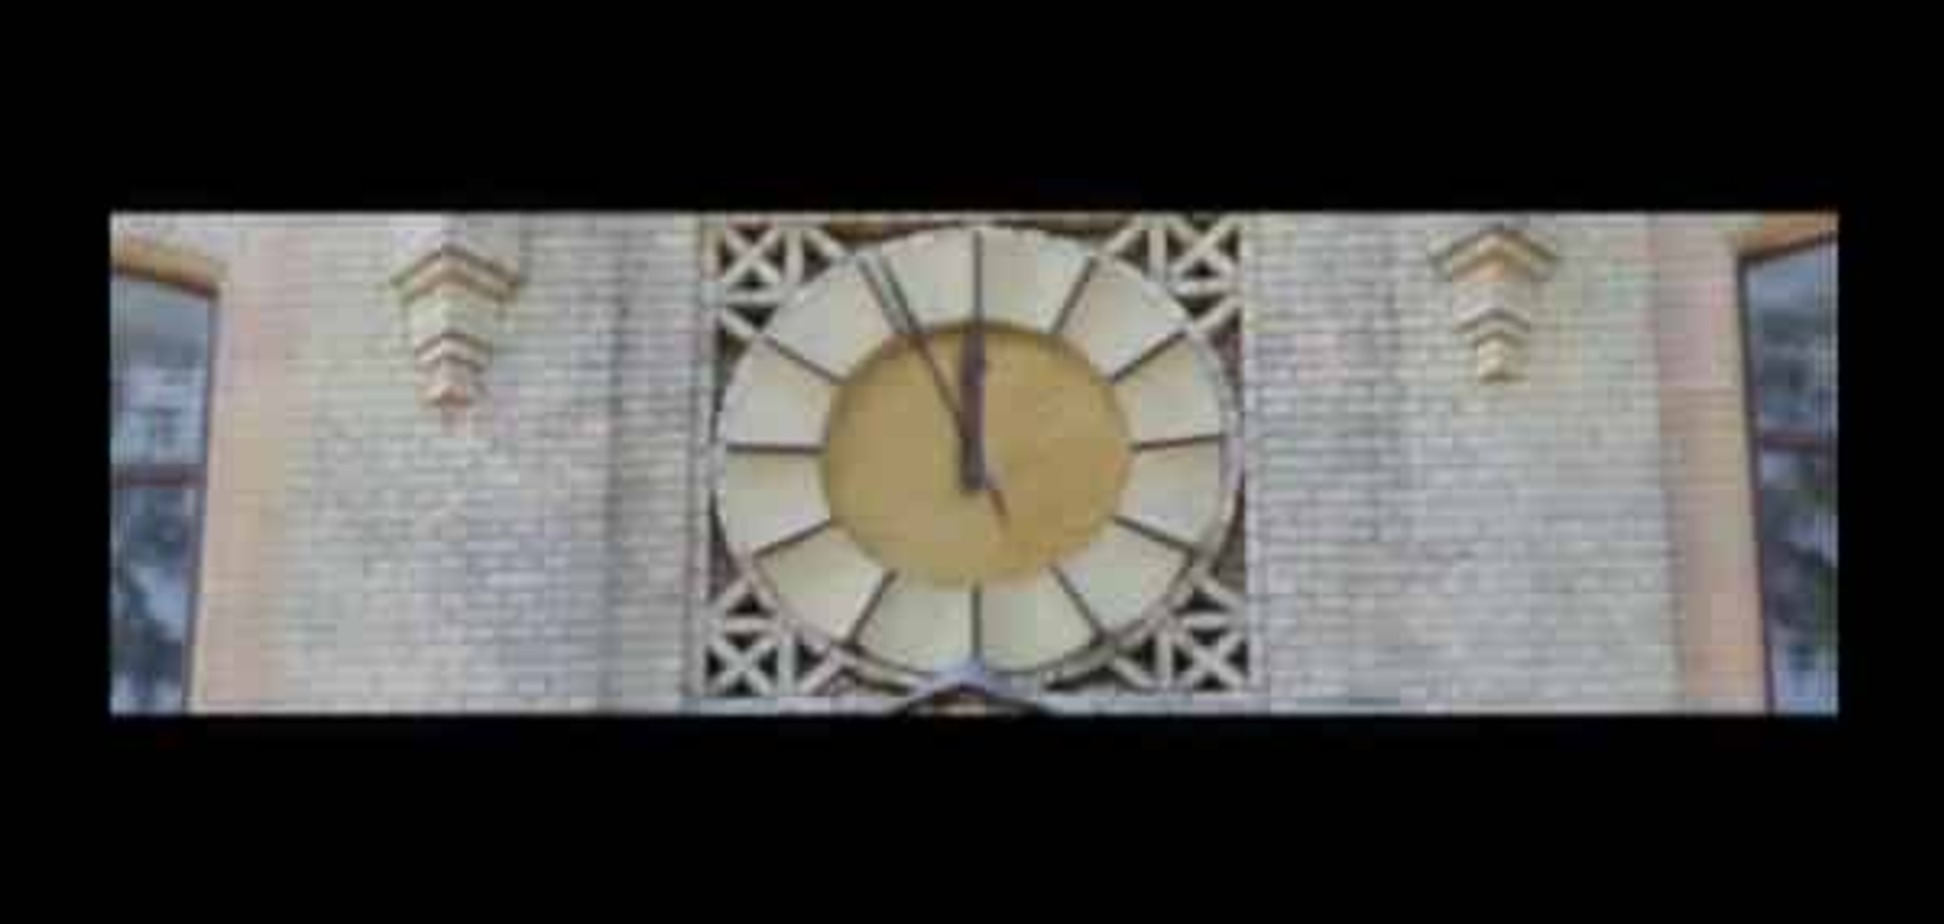 Сигнал скорби: Меджлис объявил акцию солидарности с крымскими татарами 1